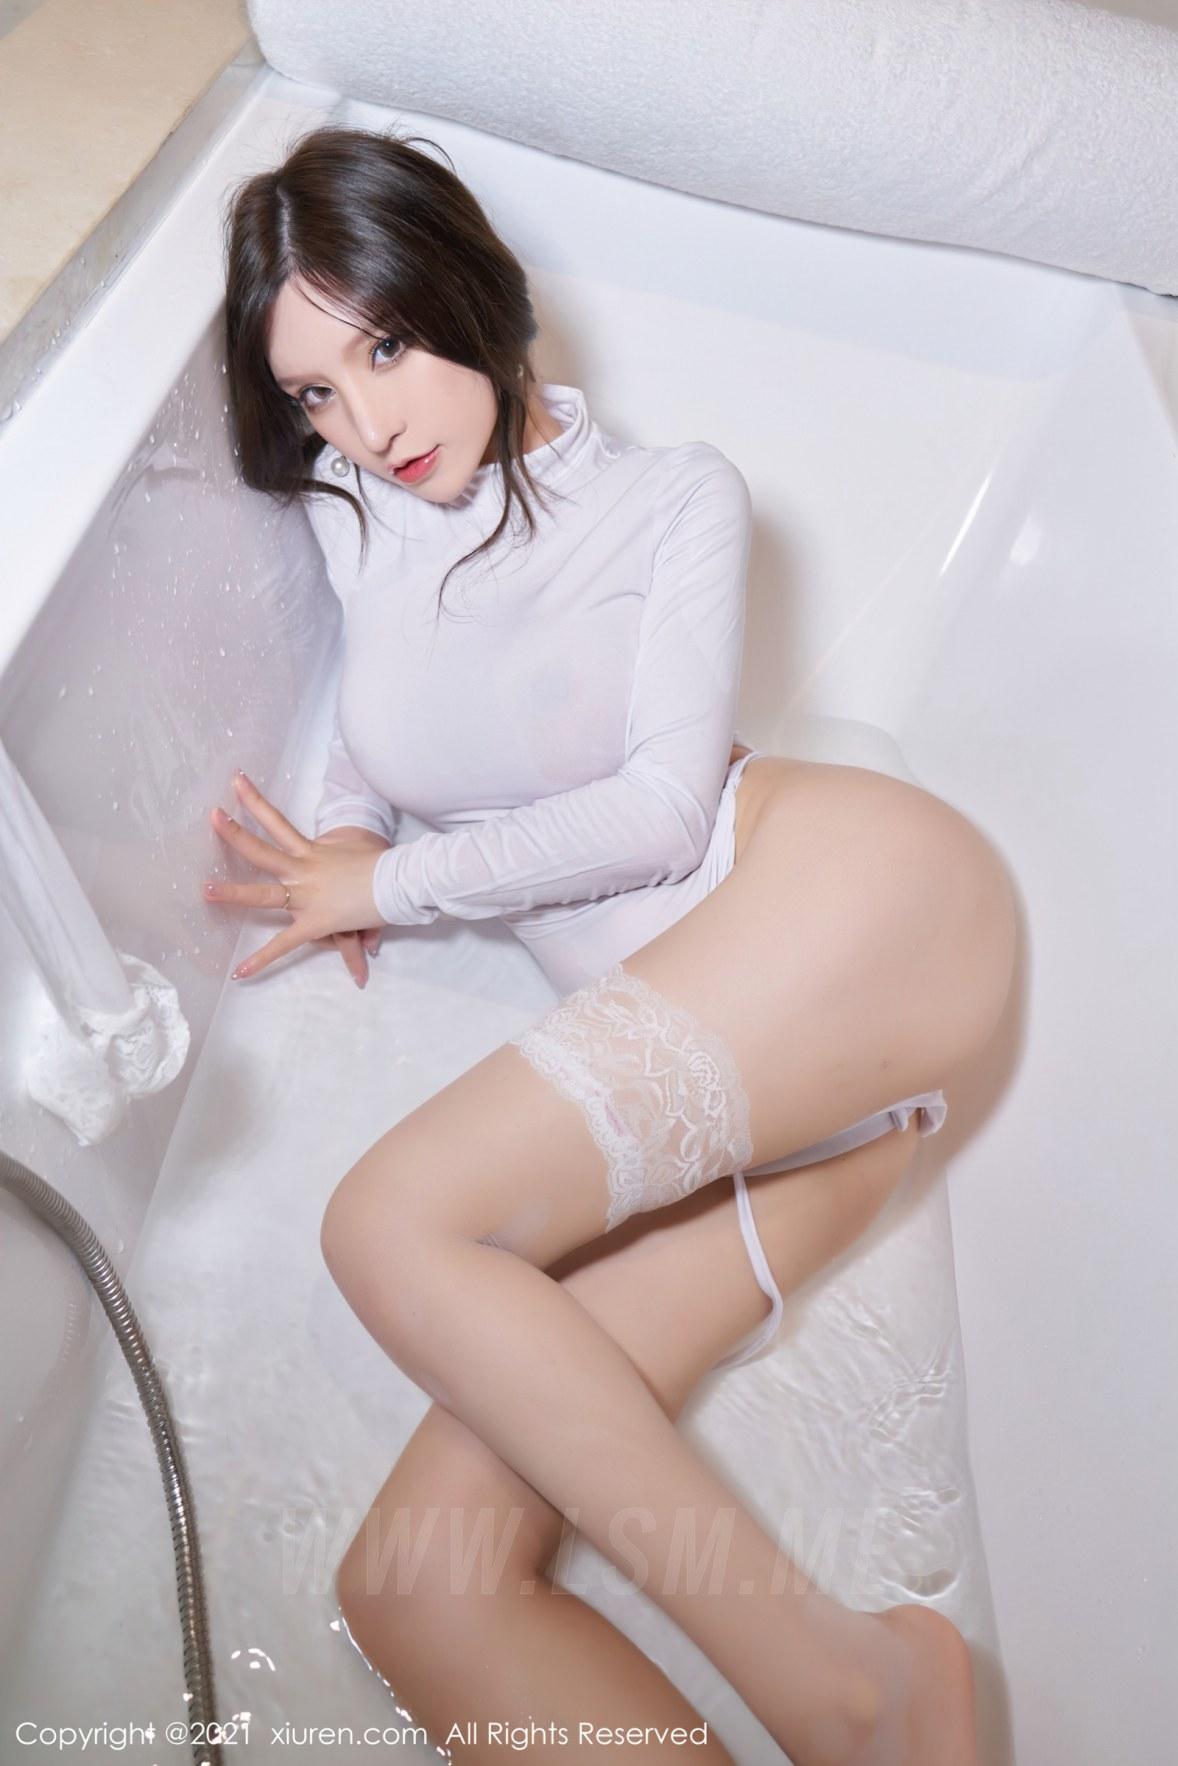 3680 090 8zl 3603 5400 - XiuRen 秀人 No.3680 浴室蕾丝袜 周于希Sandy 性感写真111 - 秀人网 -【免费在线写真】【丽人丝语】